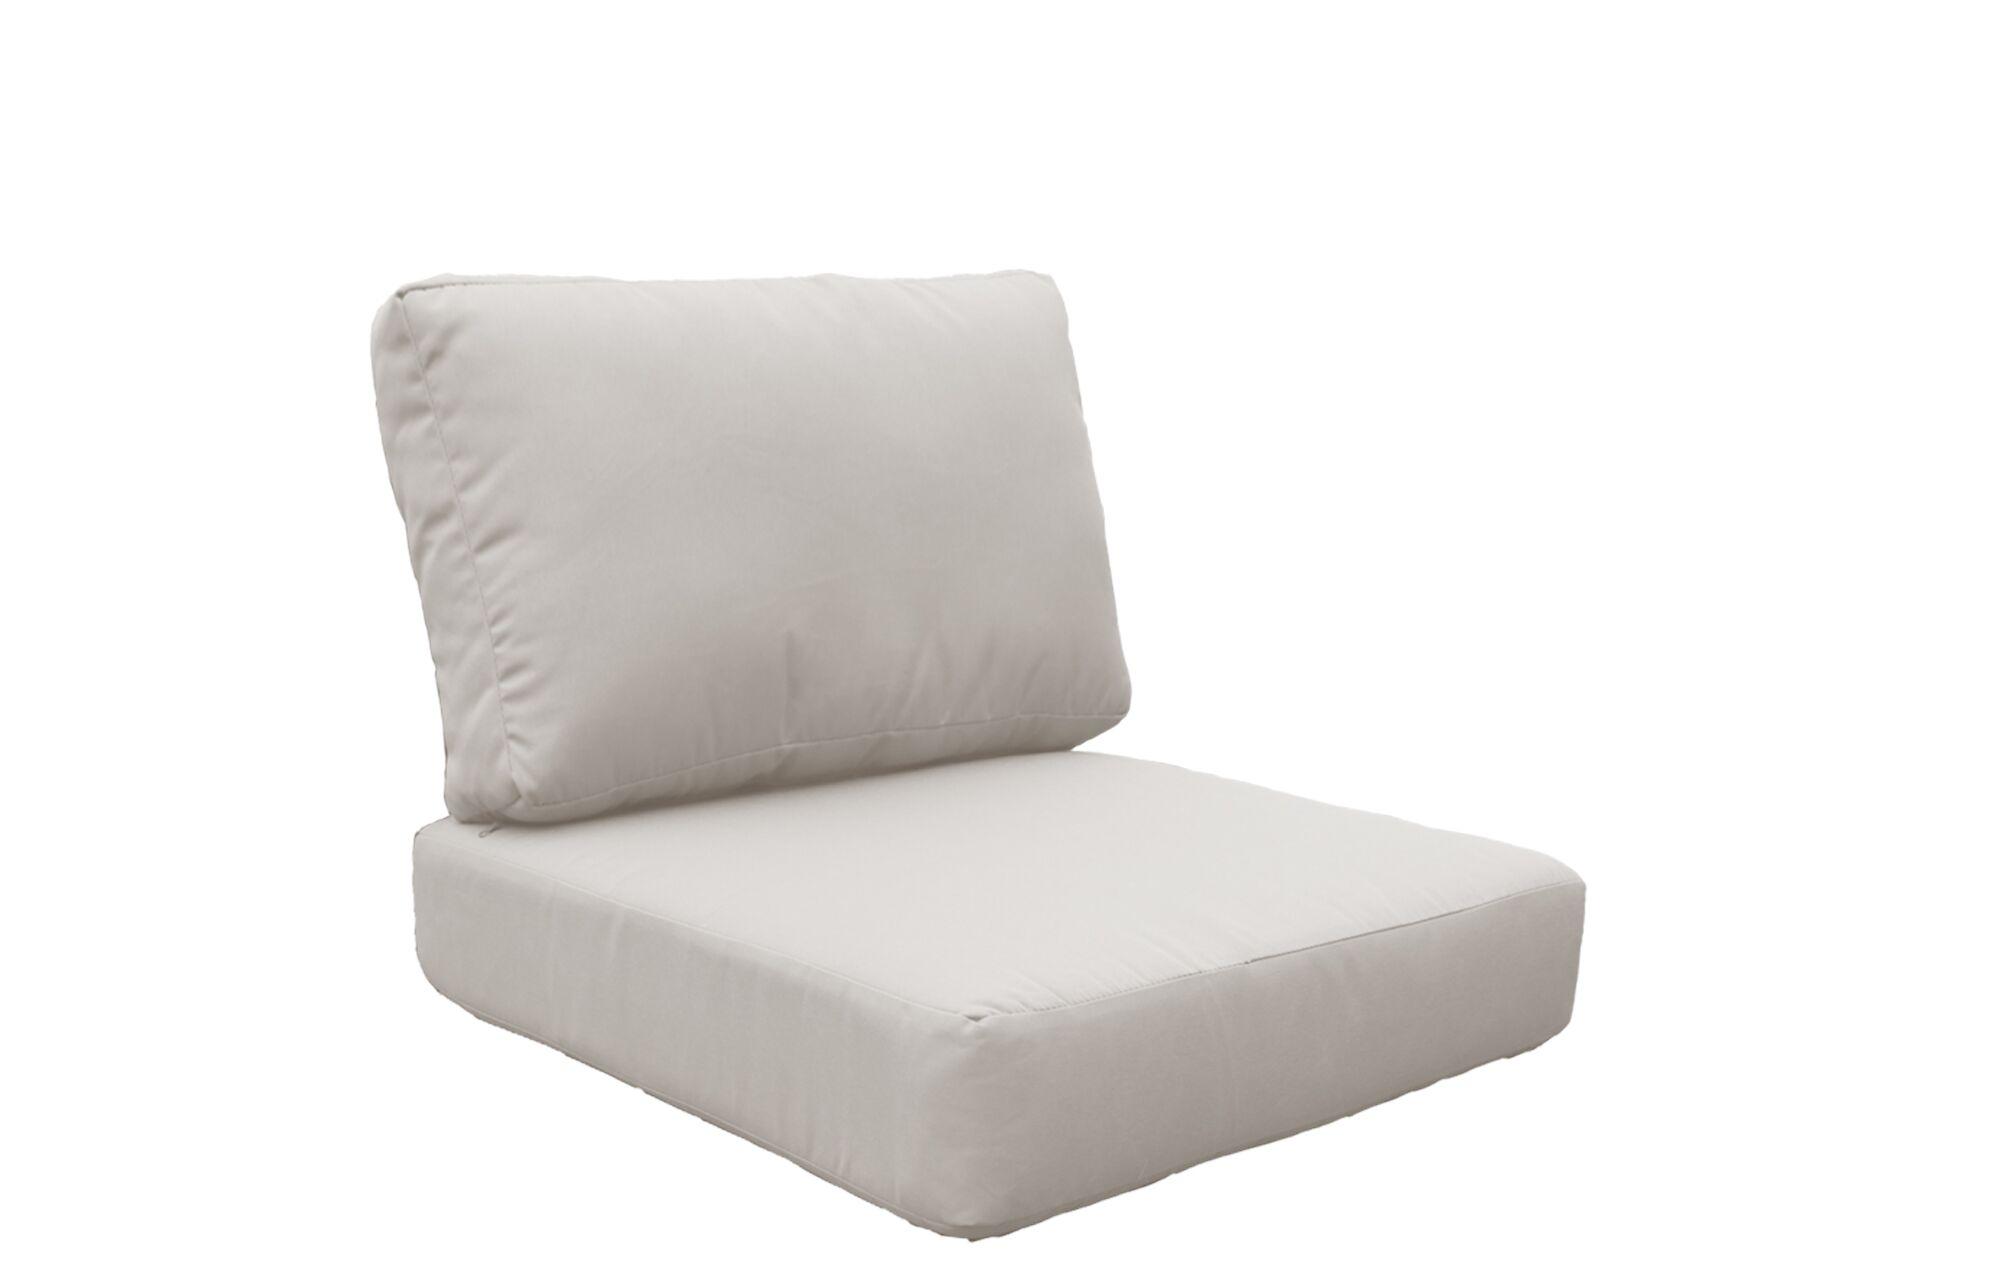 Coast 8 Piece Outdoor�Lounge Chair Cushion Set Fabric: Beige